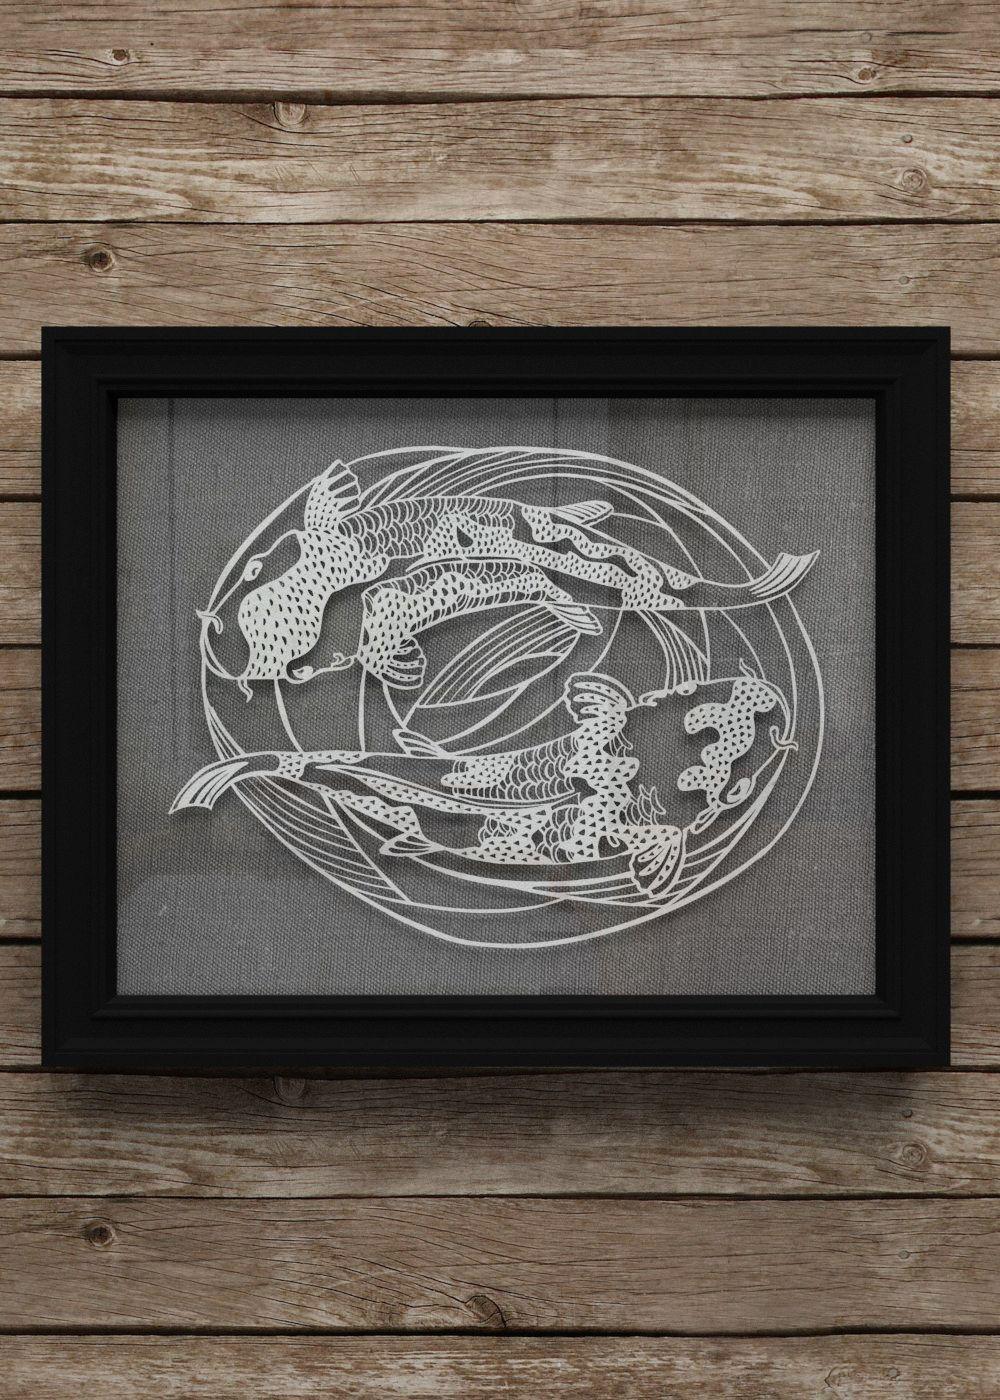 Koi fish papercut art decor - Japanese style swimming koi//carp papercutting original wall art for home decor, unique gift